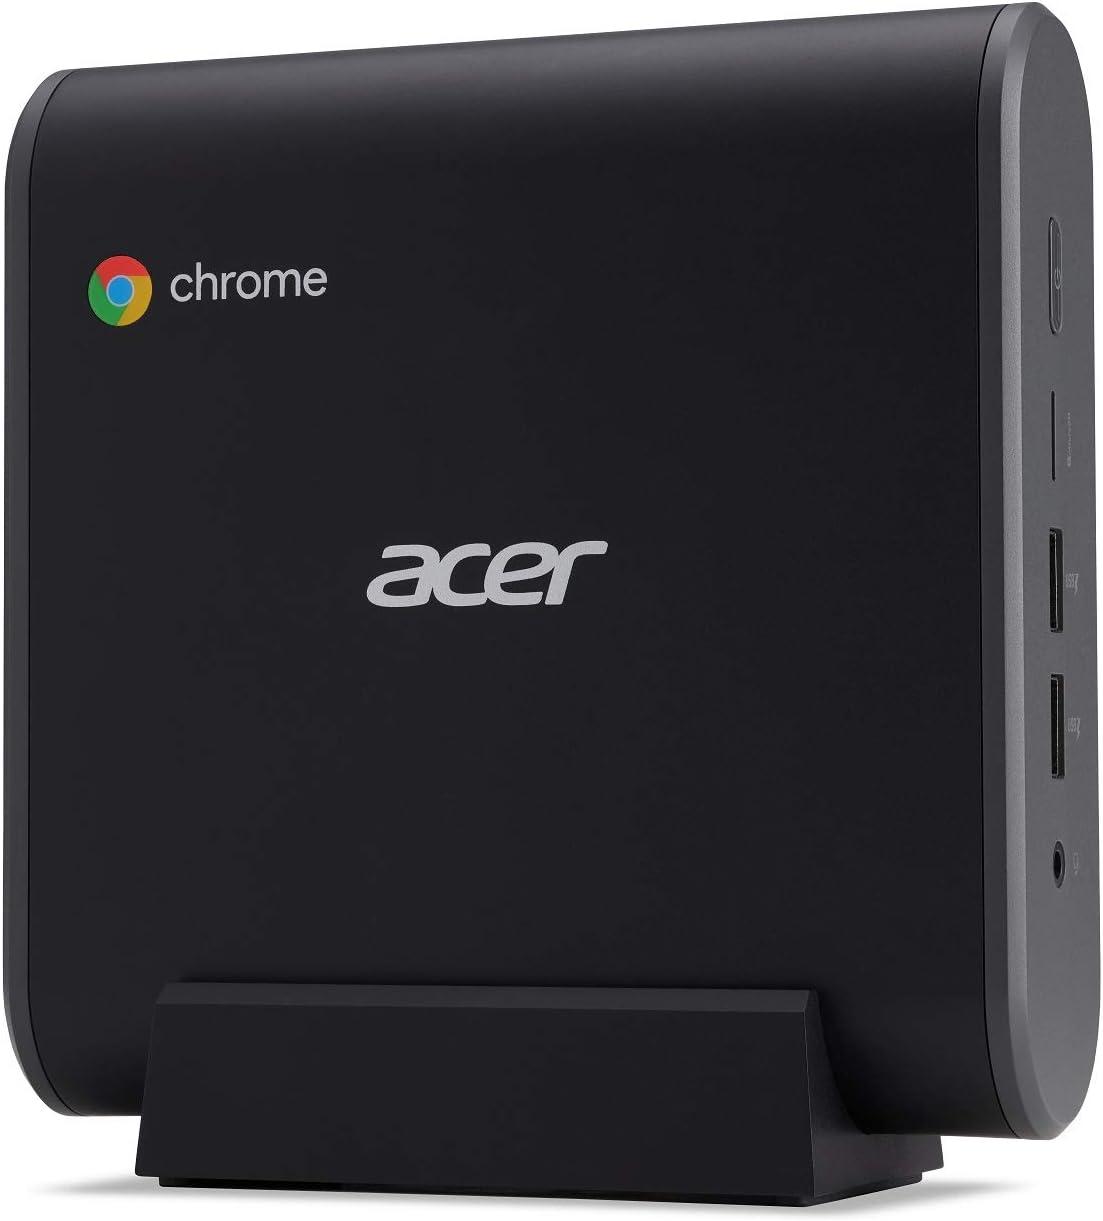 Acer Chromebox CXI3-i38GNKM, Intel i3-7130U, 8GB DDR4, 64GB SSD, Google Chrome Operating System